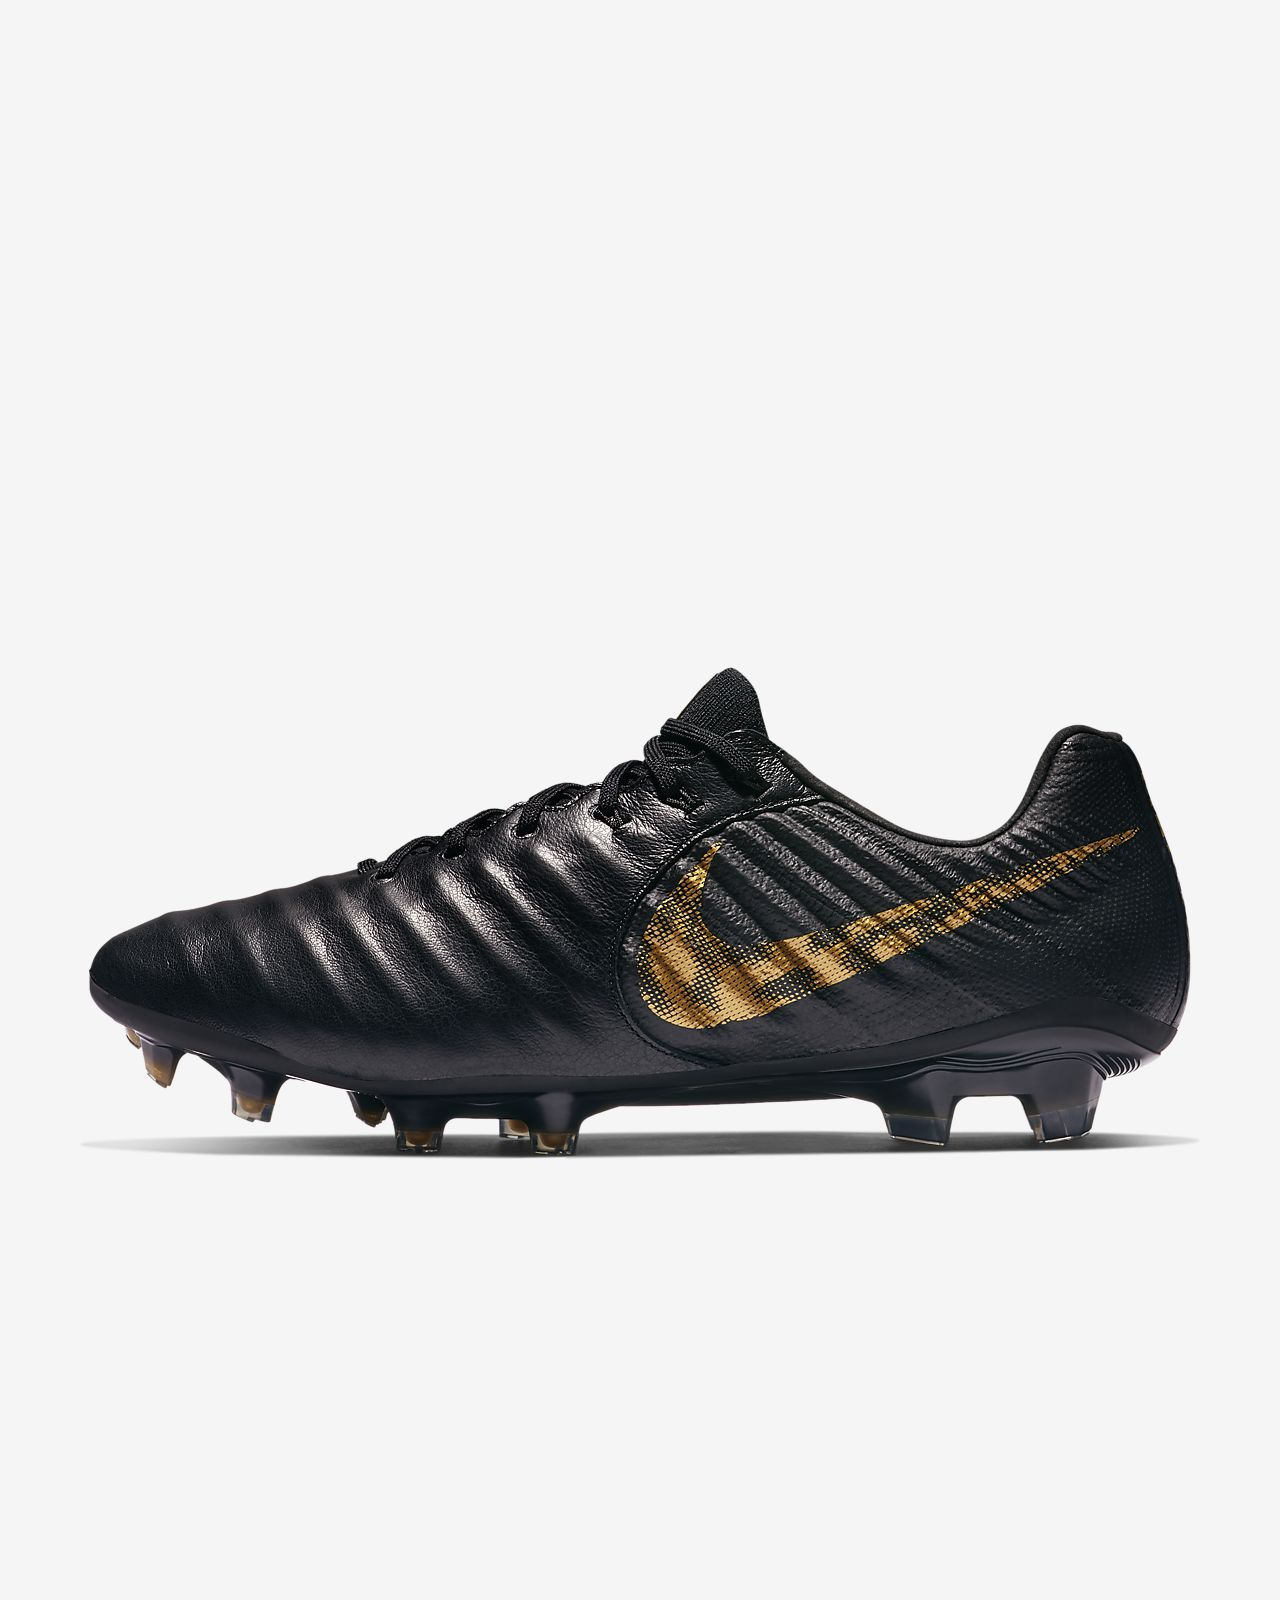 Nike Tiempo Legend 7 Elite FG Botas de fútbol para terreno firme